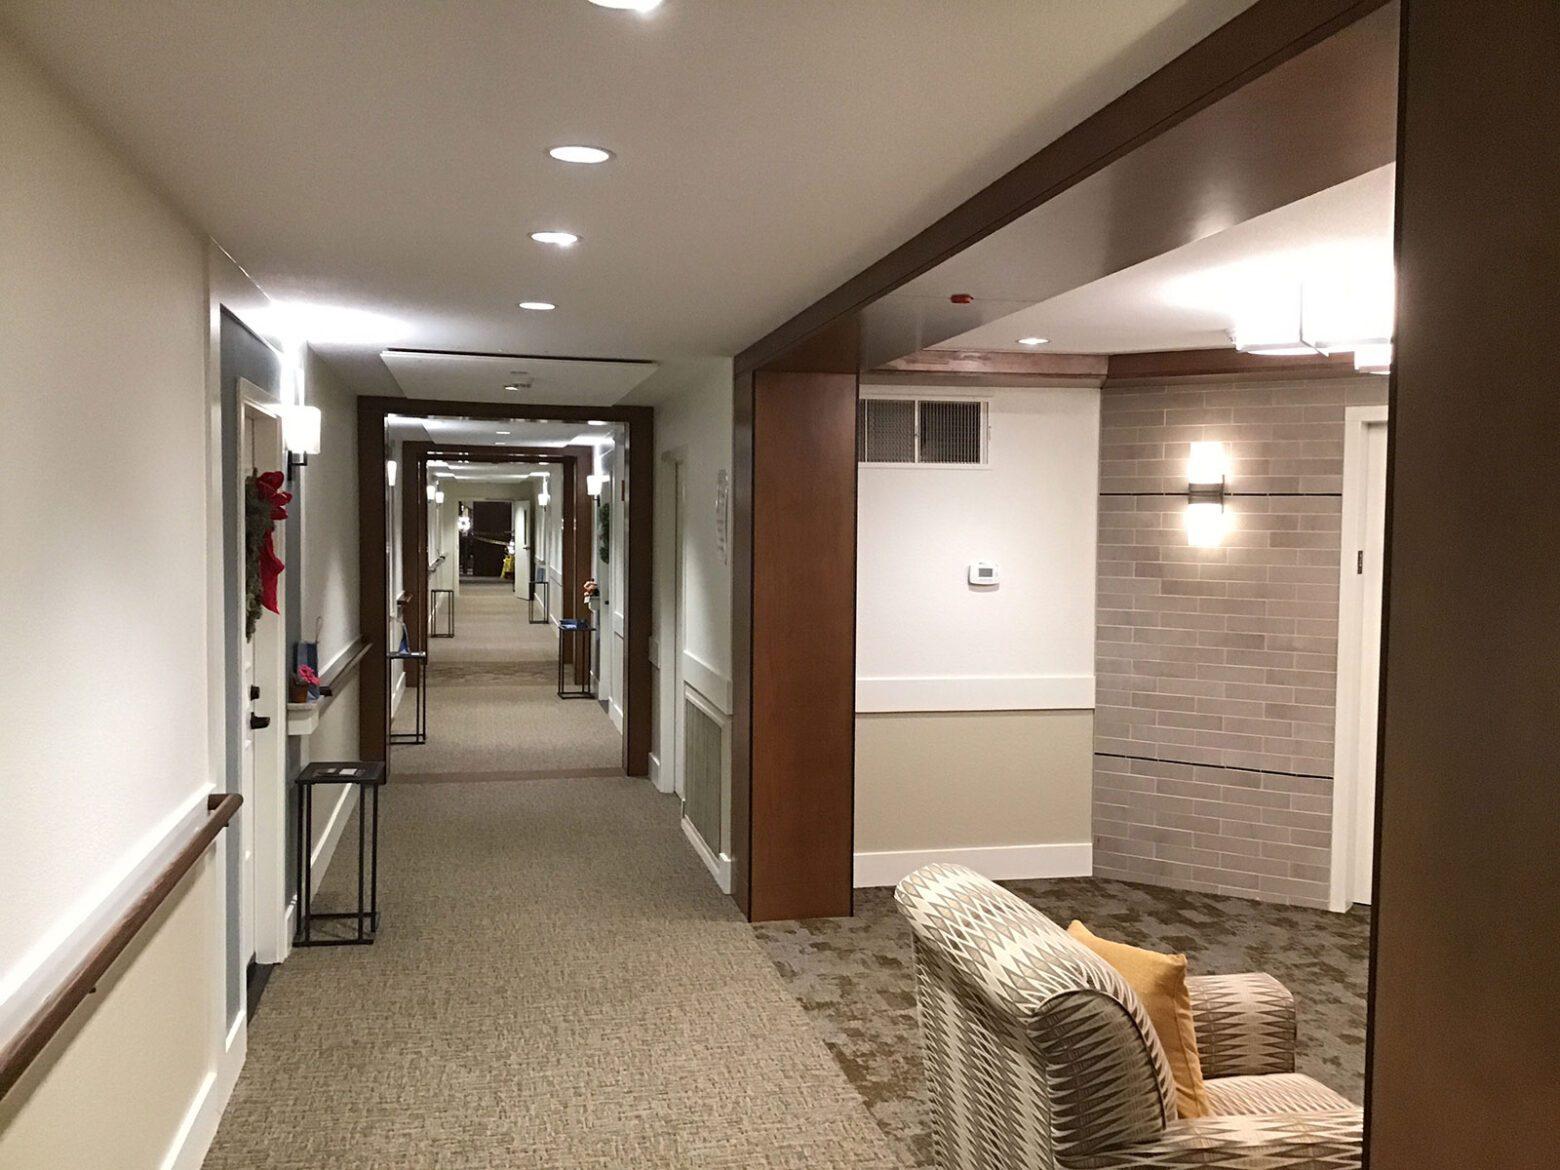 Meadows of Napa Valley Memory Care and Corridor